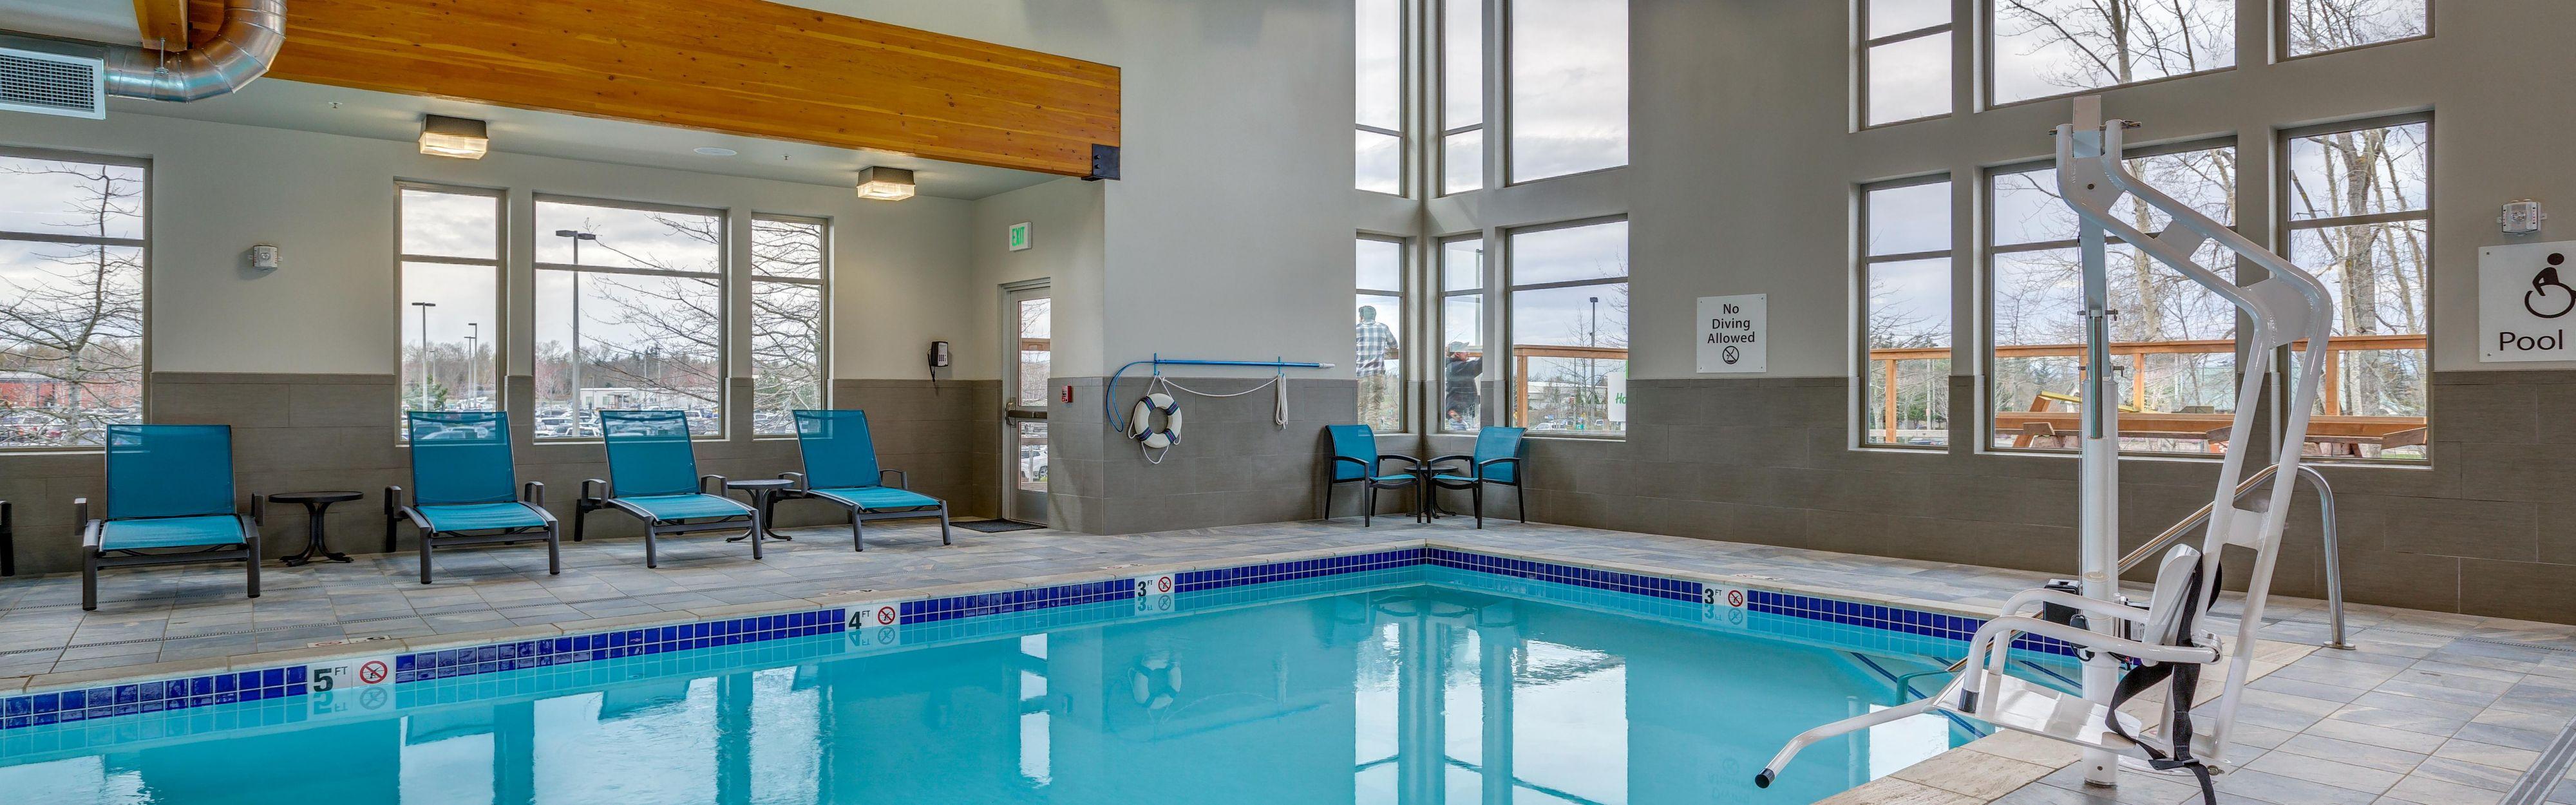 Holiday Inn & Suites Bellingham image 2